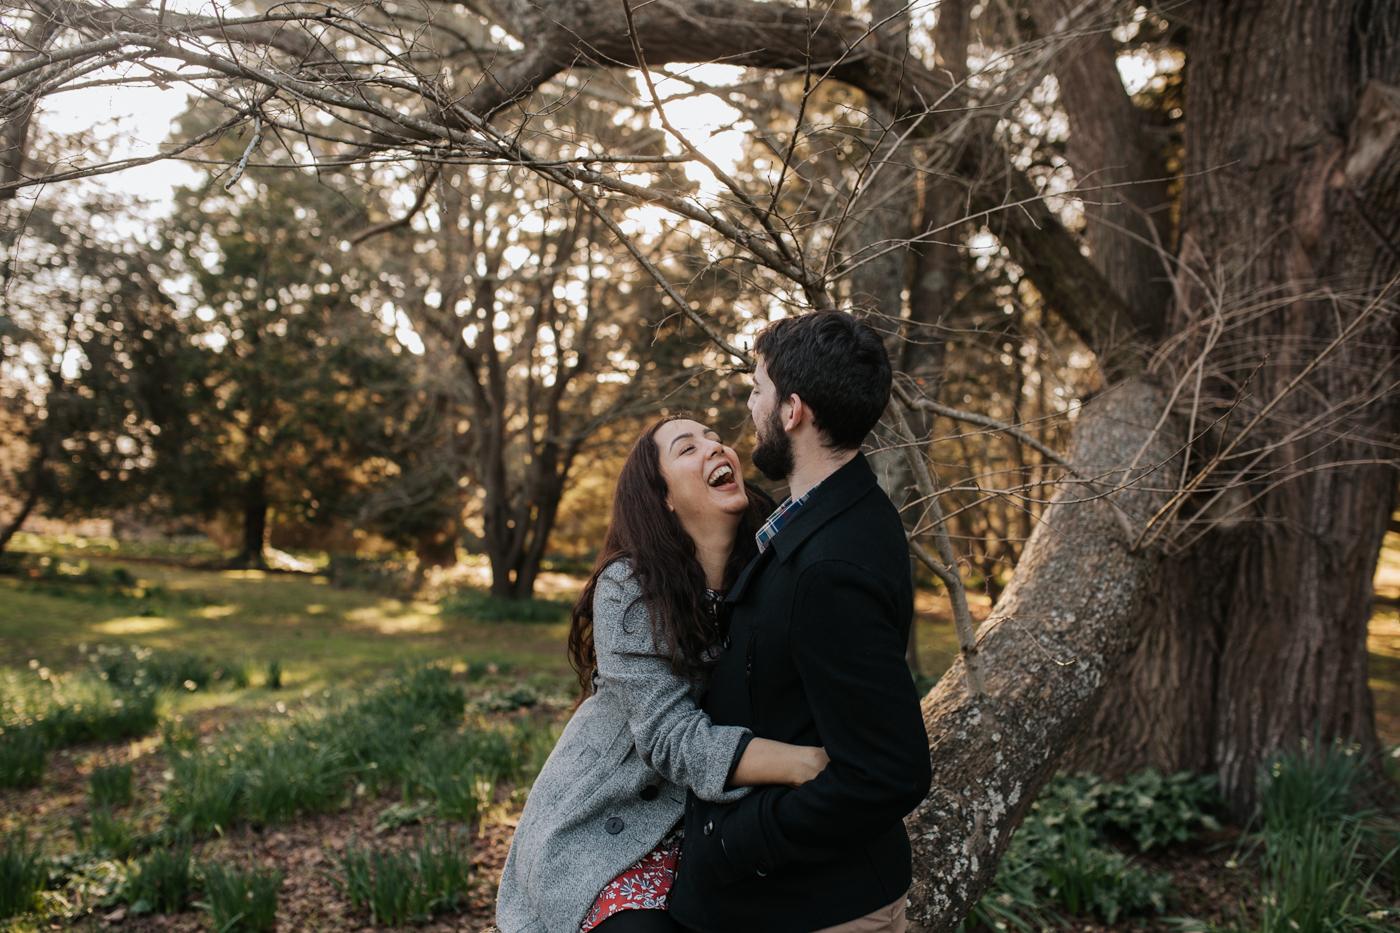 Kate & Kieran - Southern Highlands Engagement - Samantha Heather Photography-22.jpg